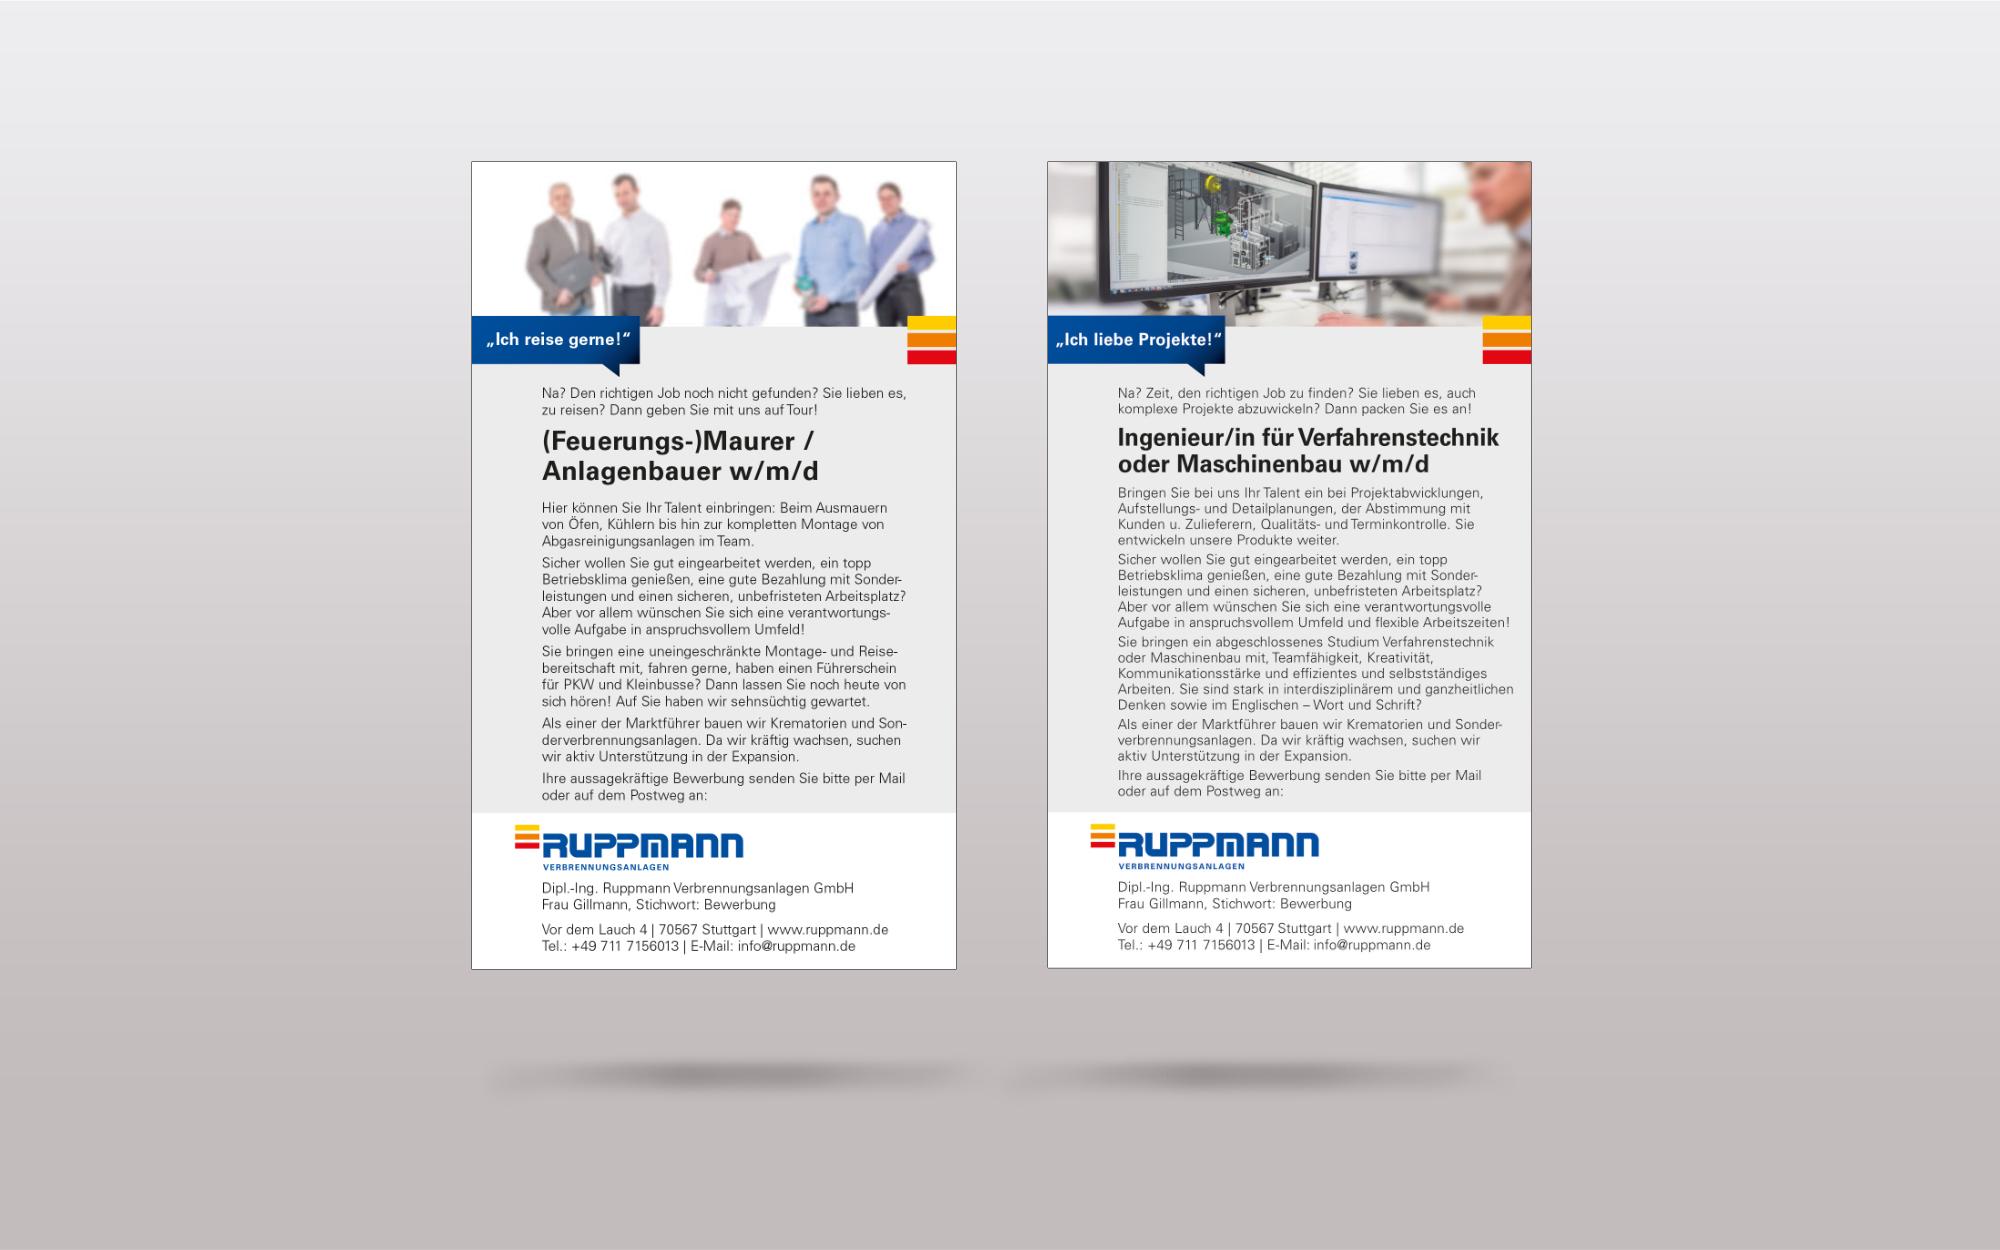 Relaunch Unternehmen Ruppmann - Anzeige